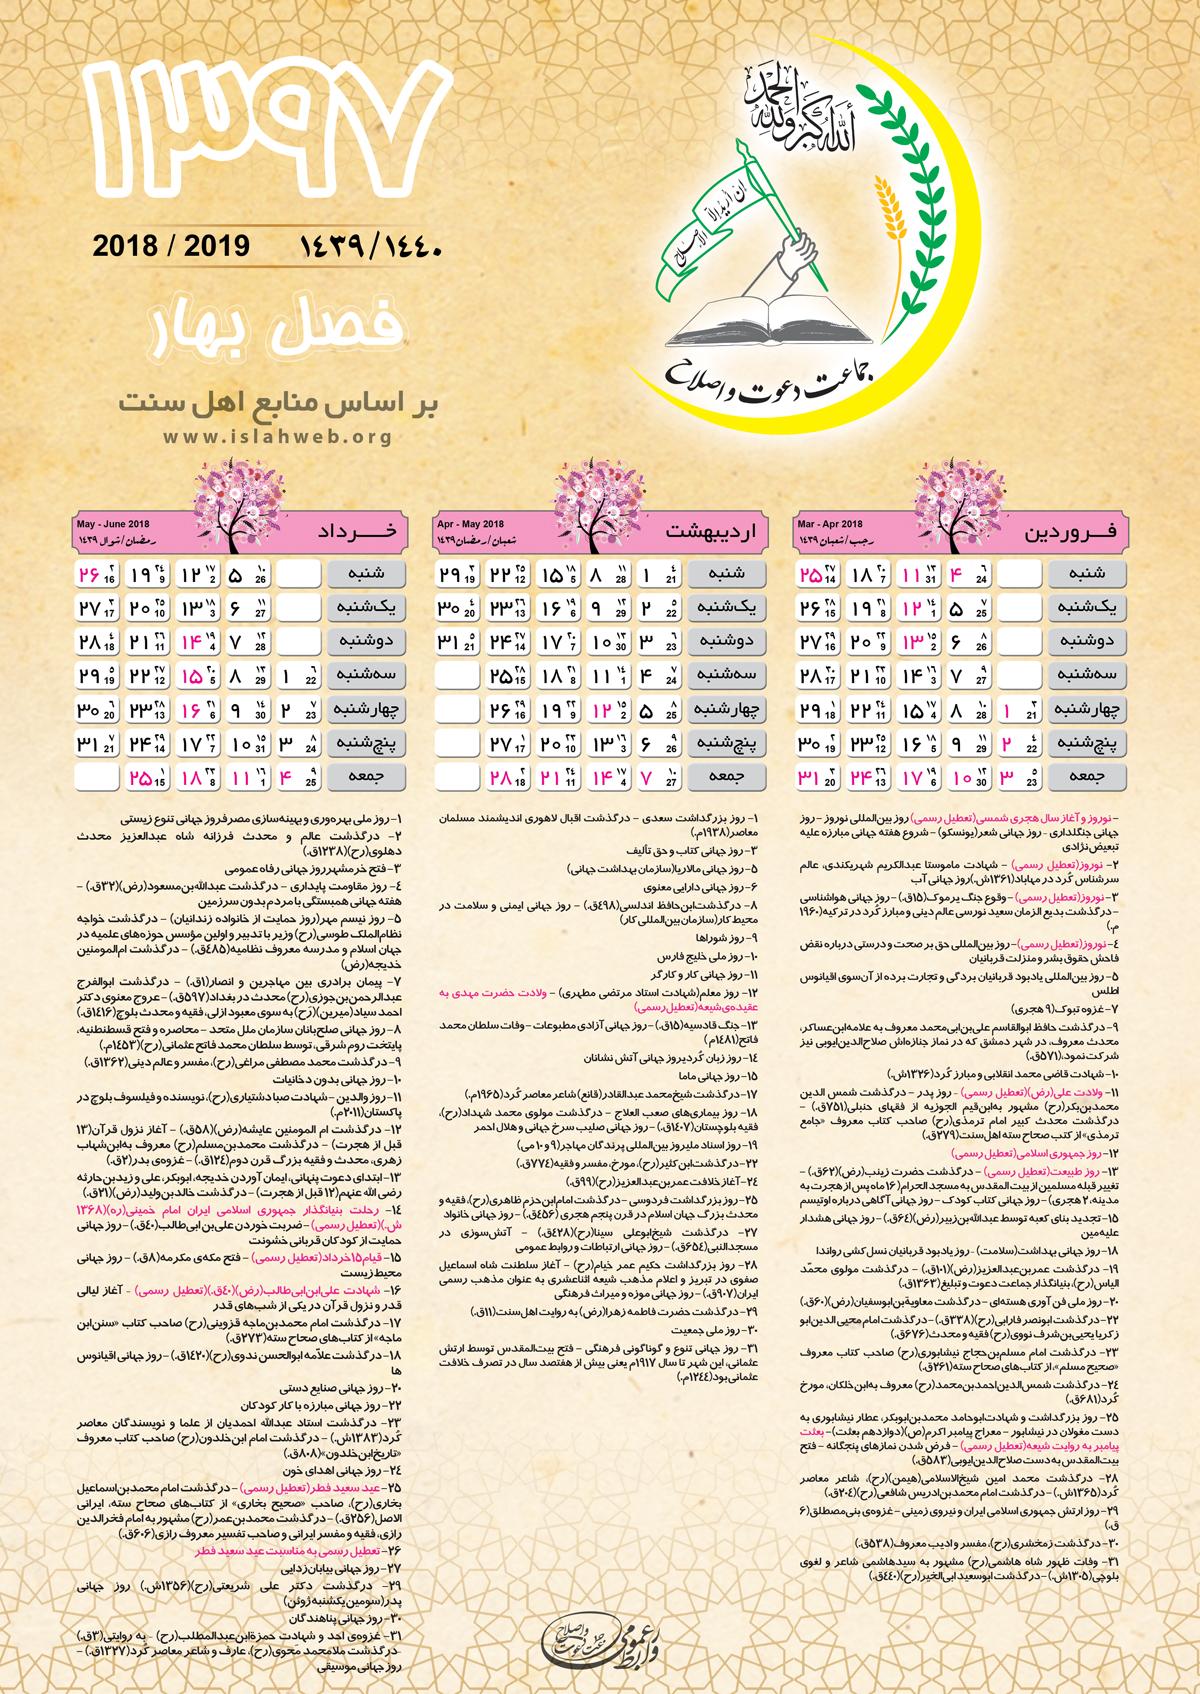 تقویم اهل سنت - بهار 1397